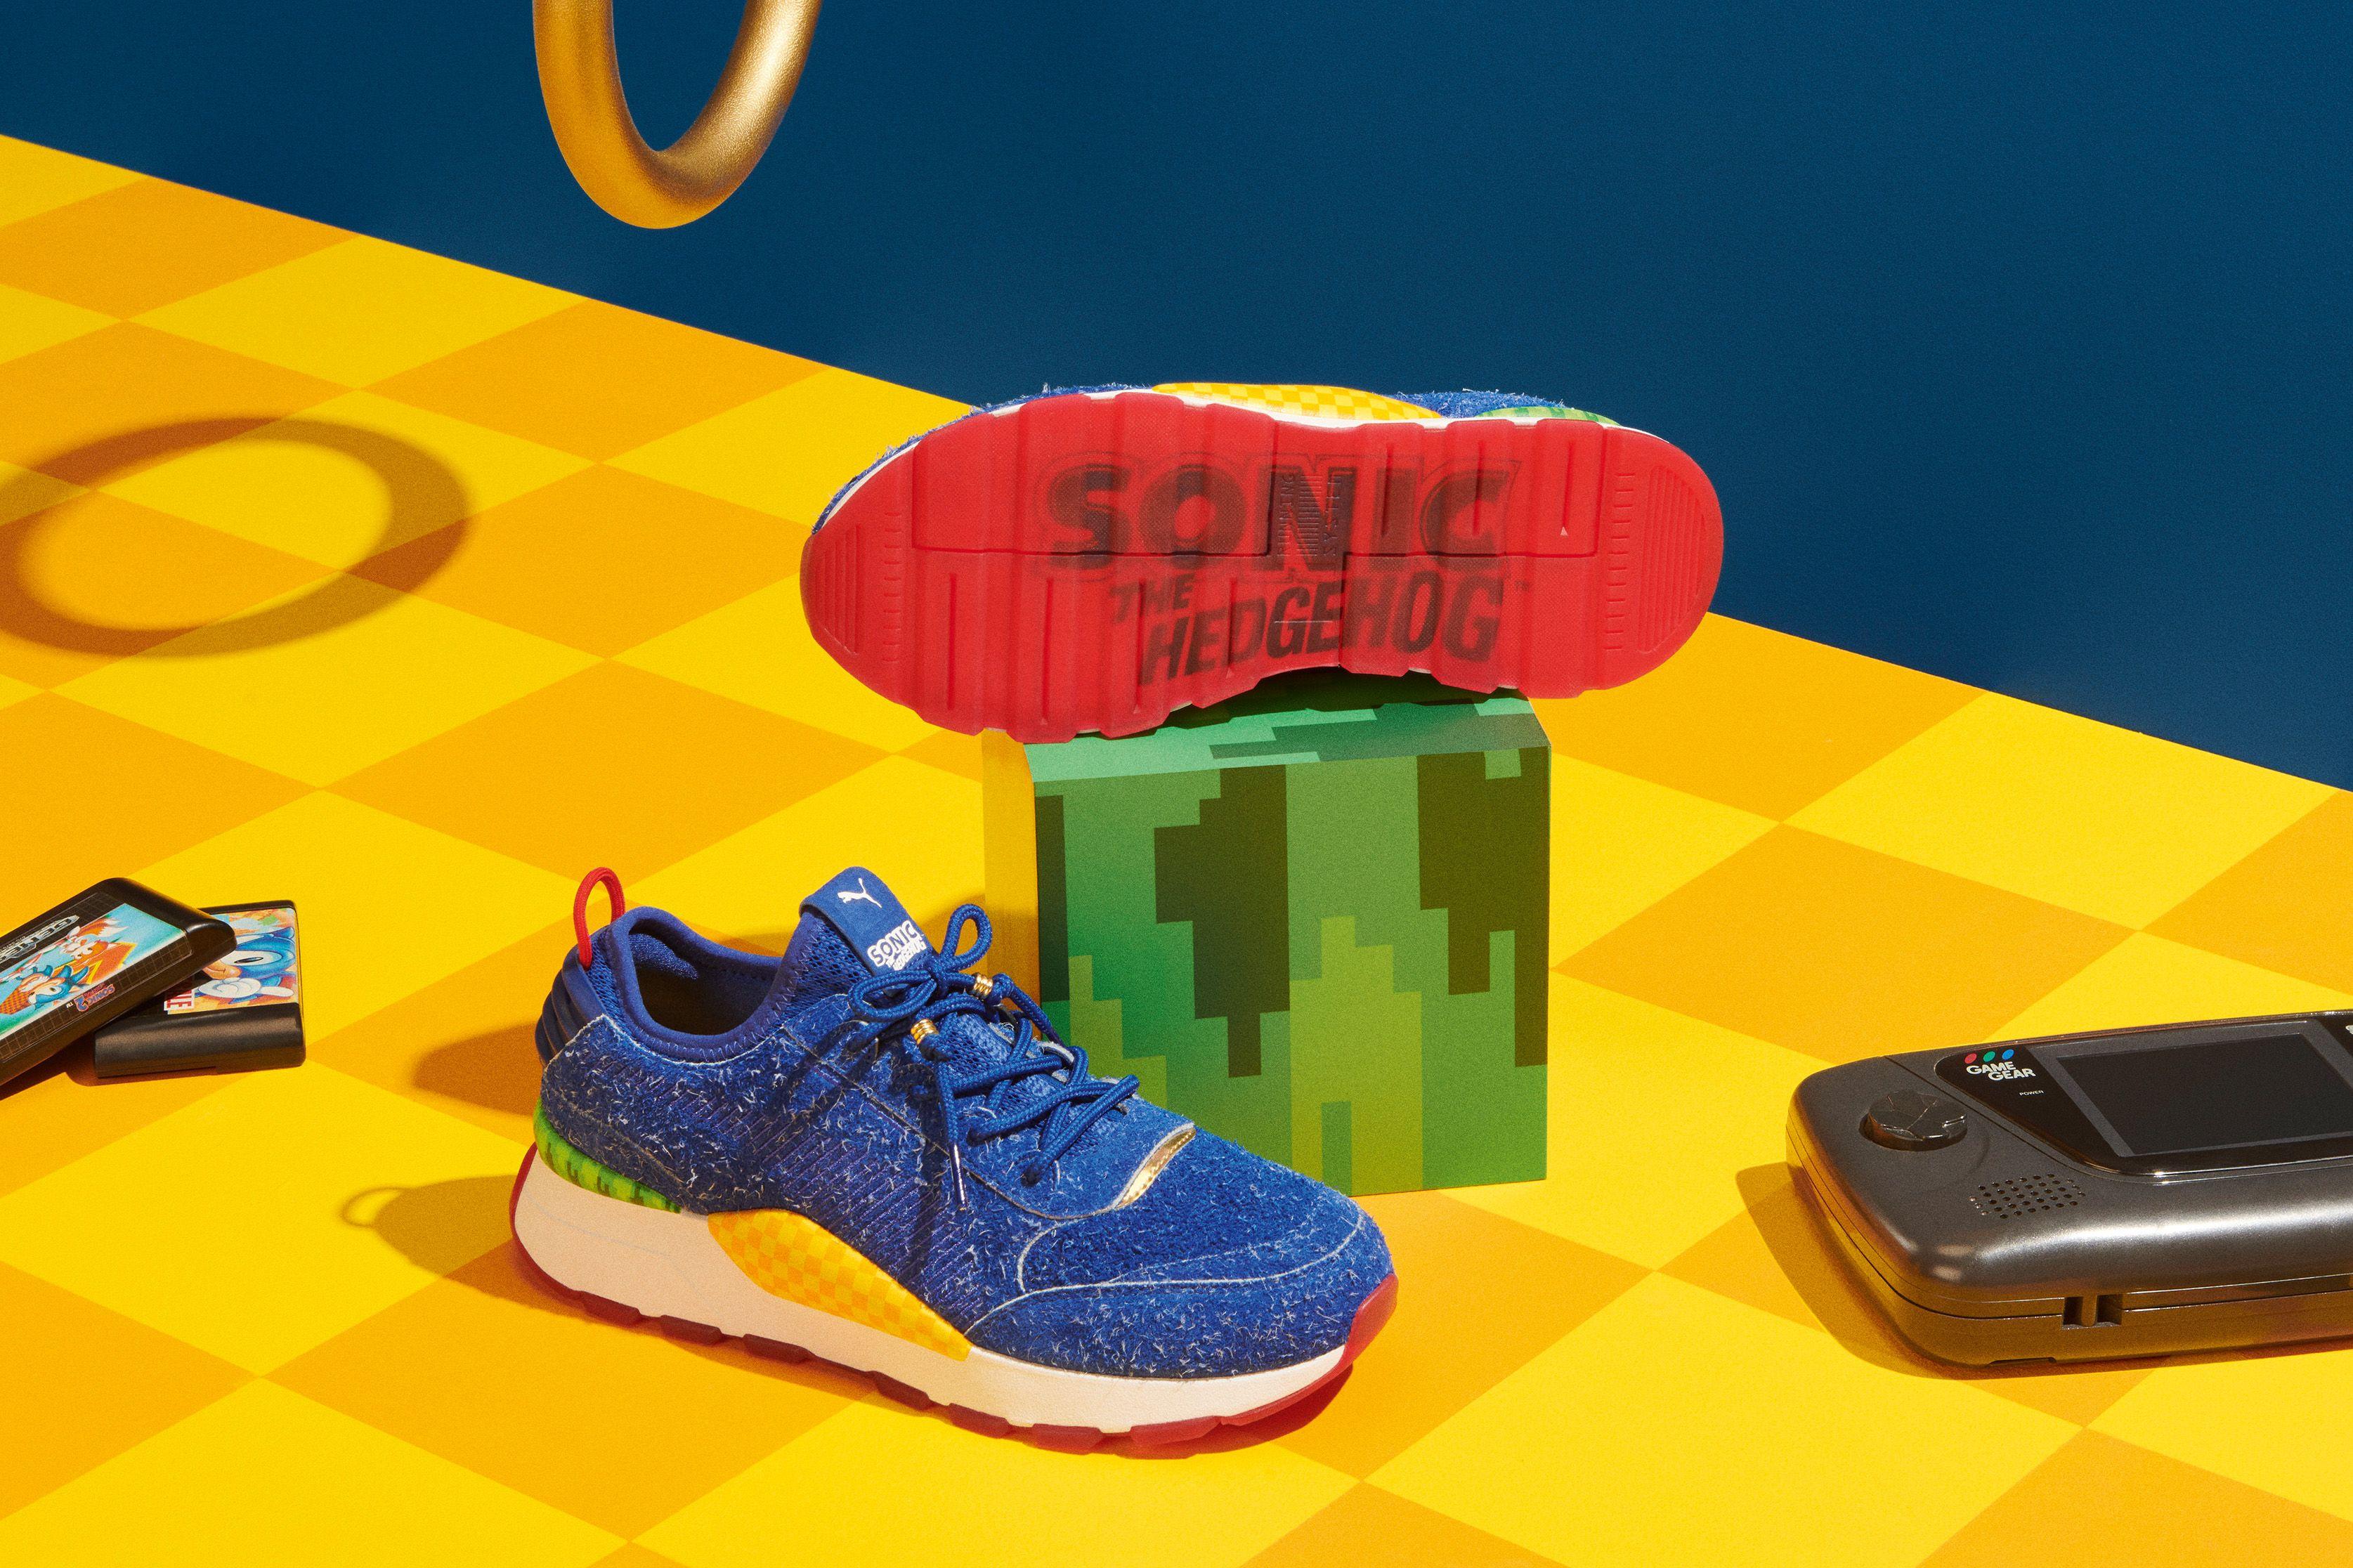 Reebok Zig Hedgehog Sonic Amarillo EivLlnxaZ4